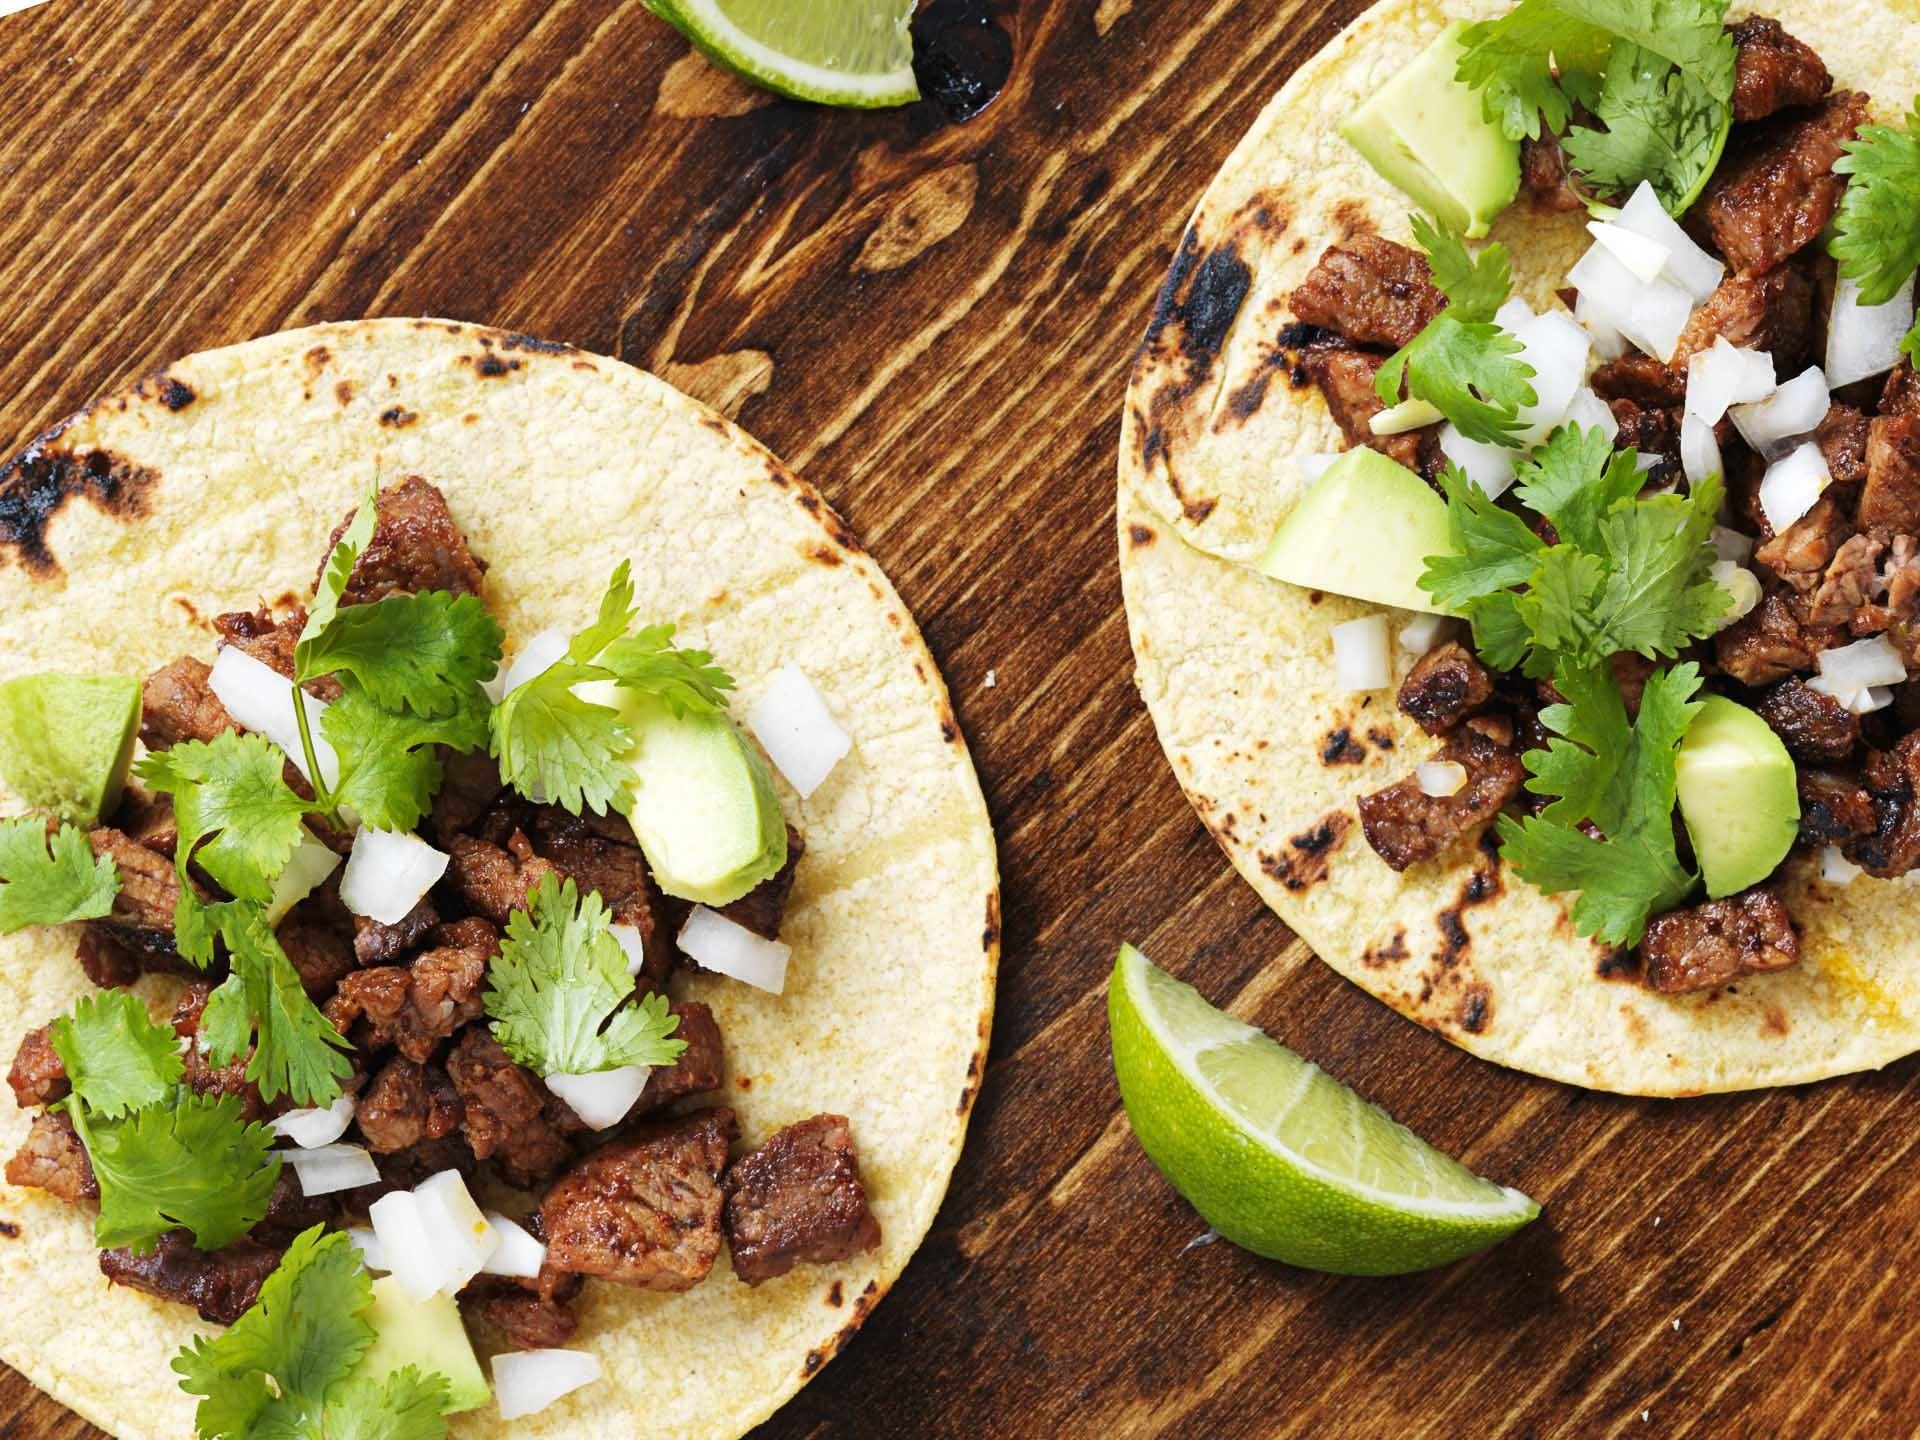 1920x1440 Mexican Food Tacos Computer Wallpaper 62874 Mexican Food 1920x1440 Wallpaper Teahub Io